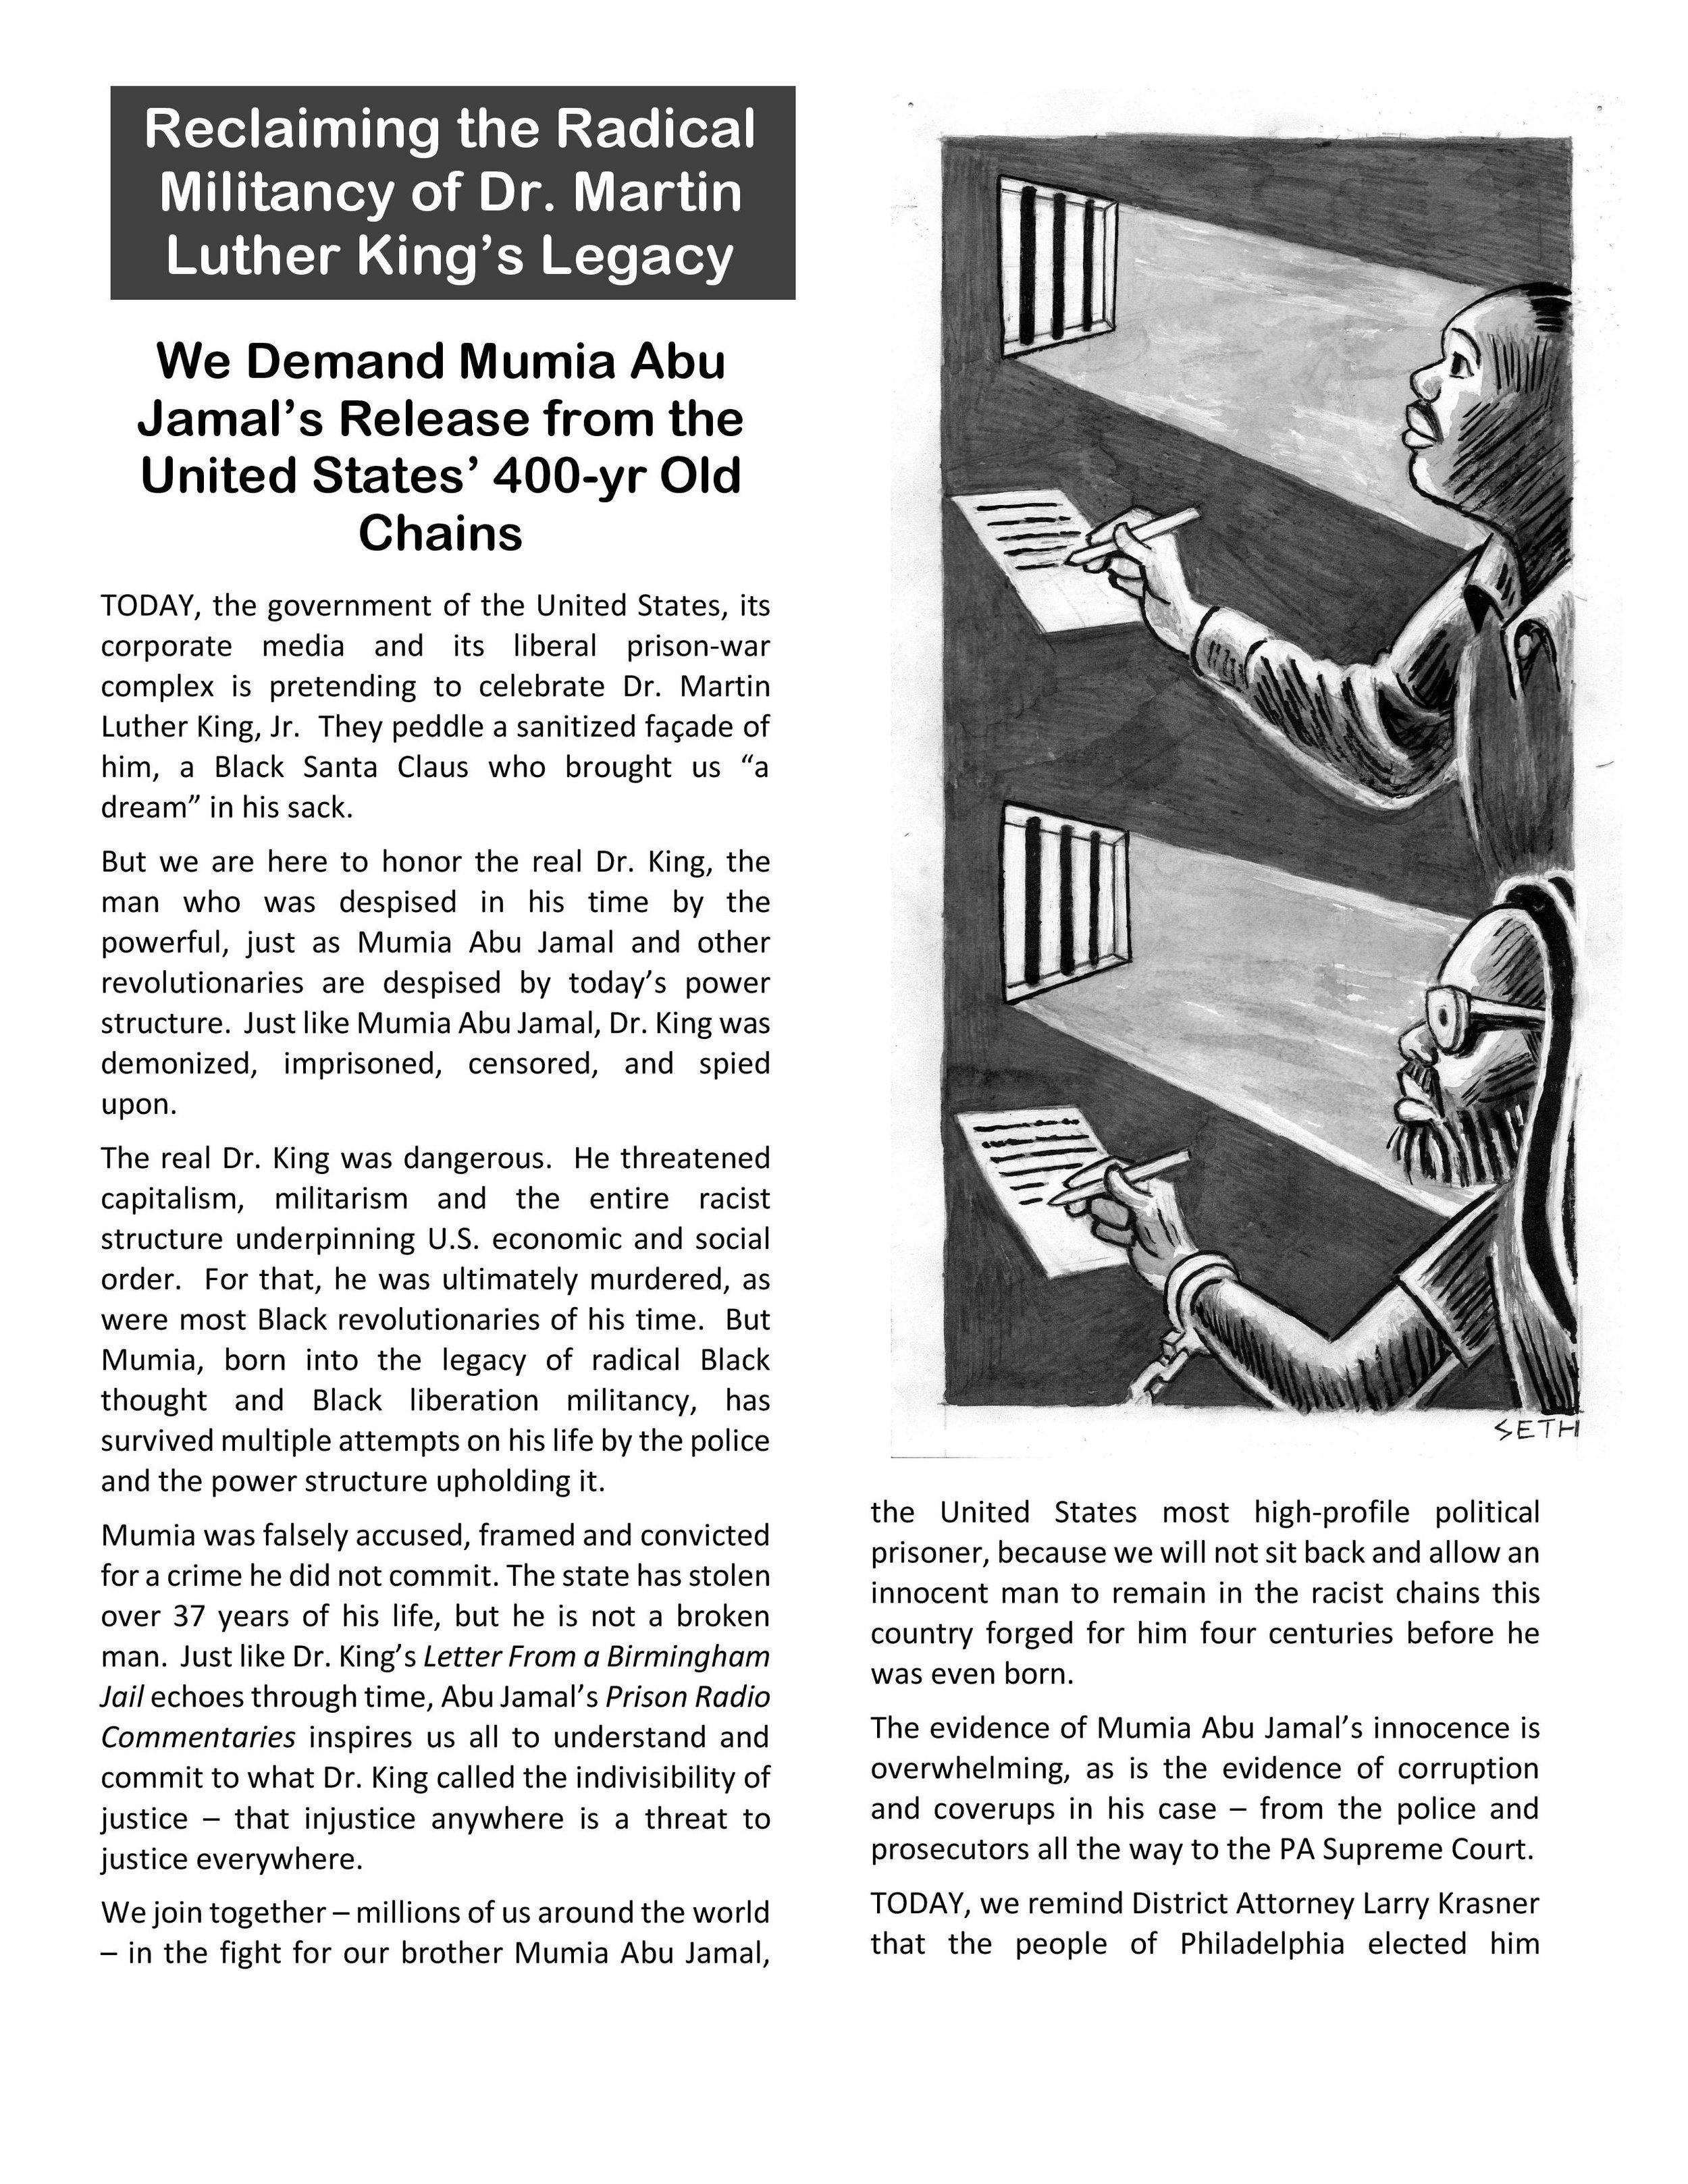 Mumia MLK Day Flyer 2019 (2)-page-001.jpg